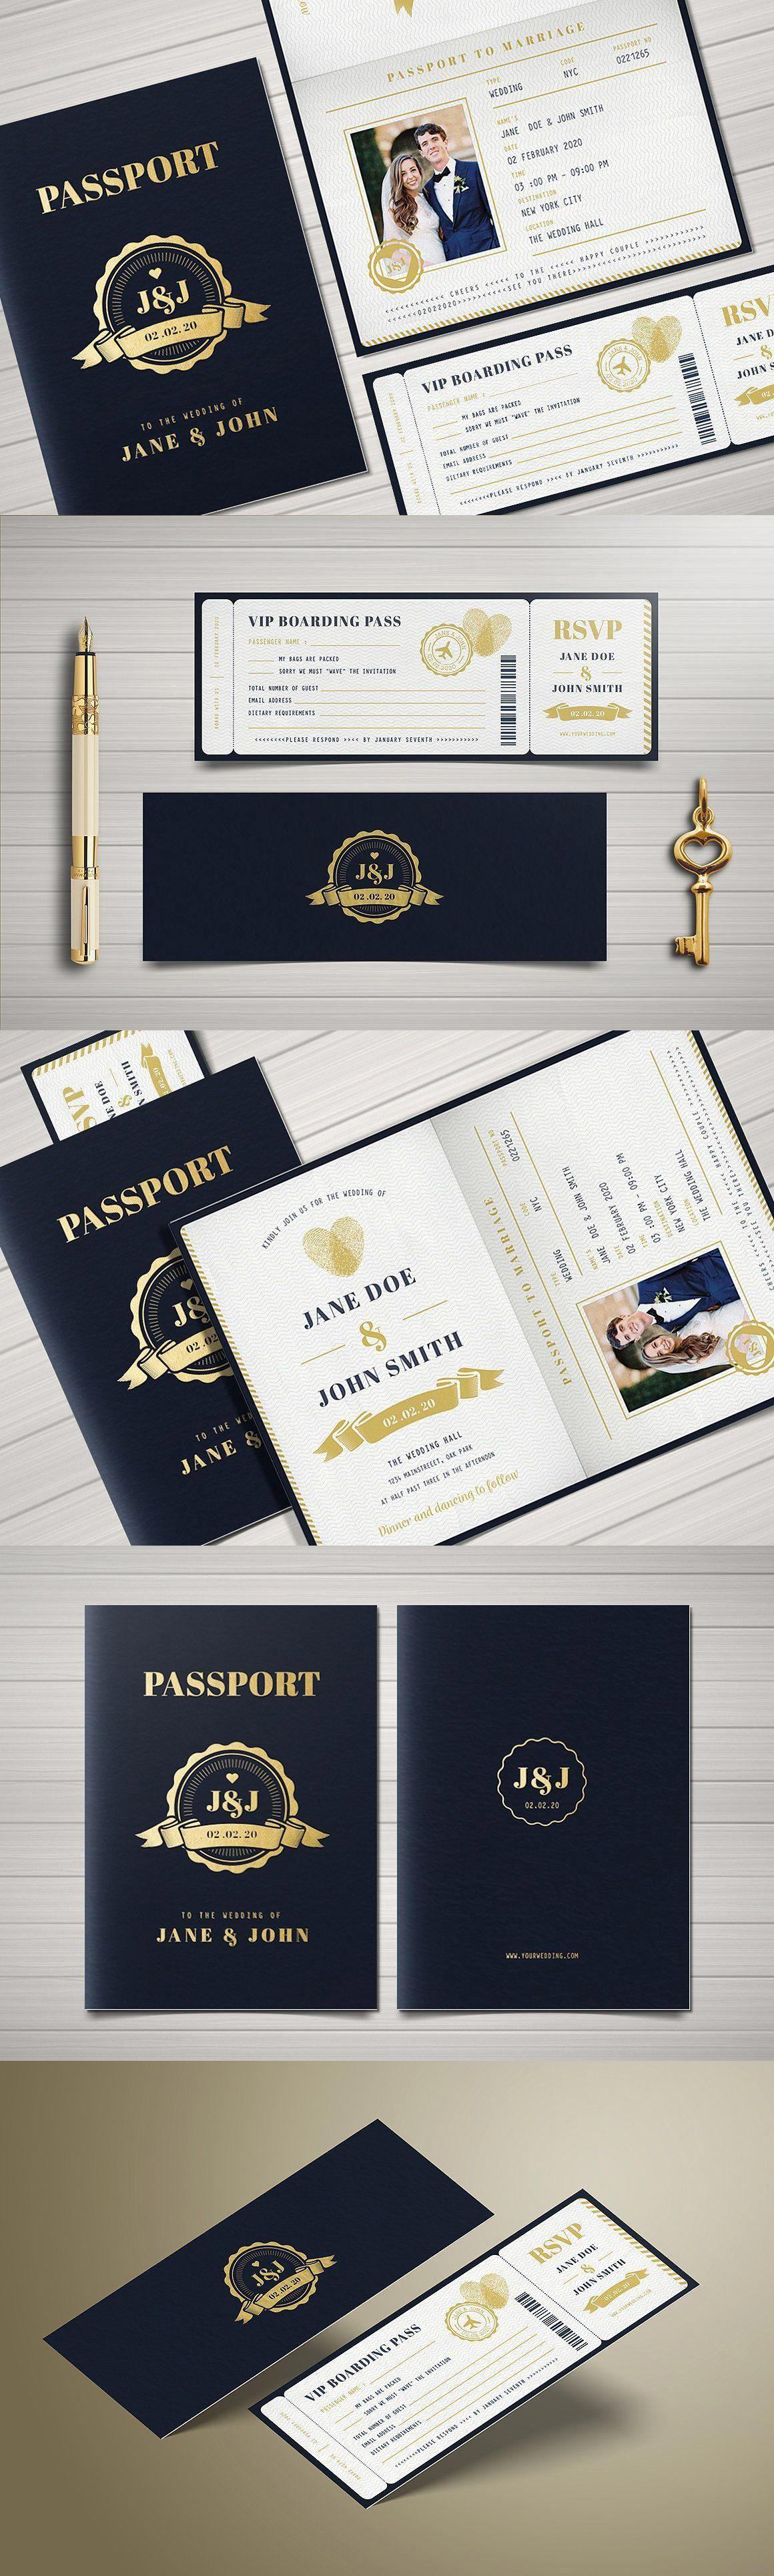 Passport Wedding Invitation Templates PSD AI